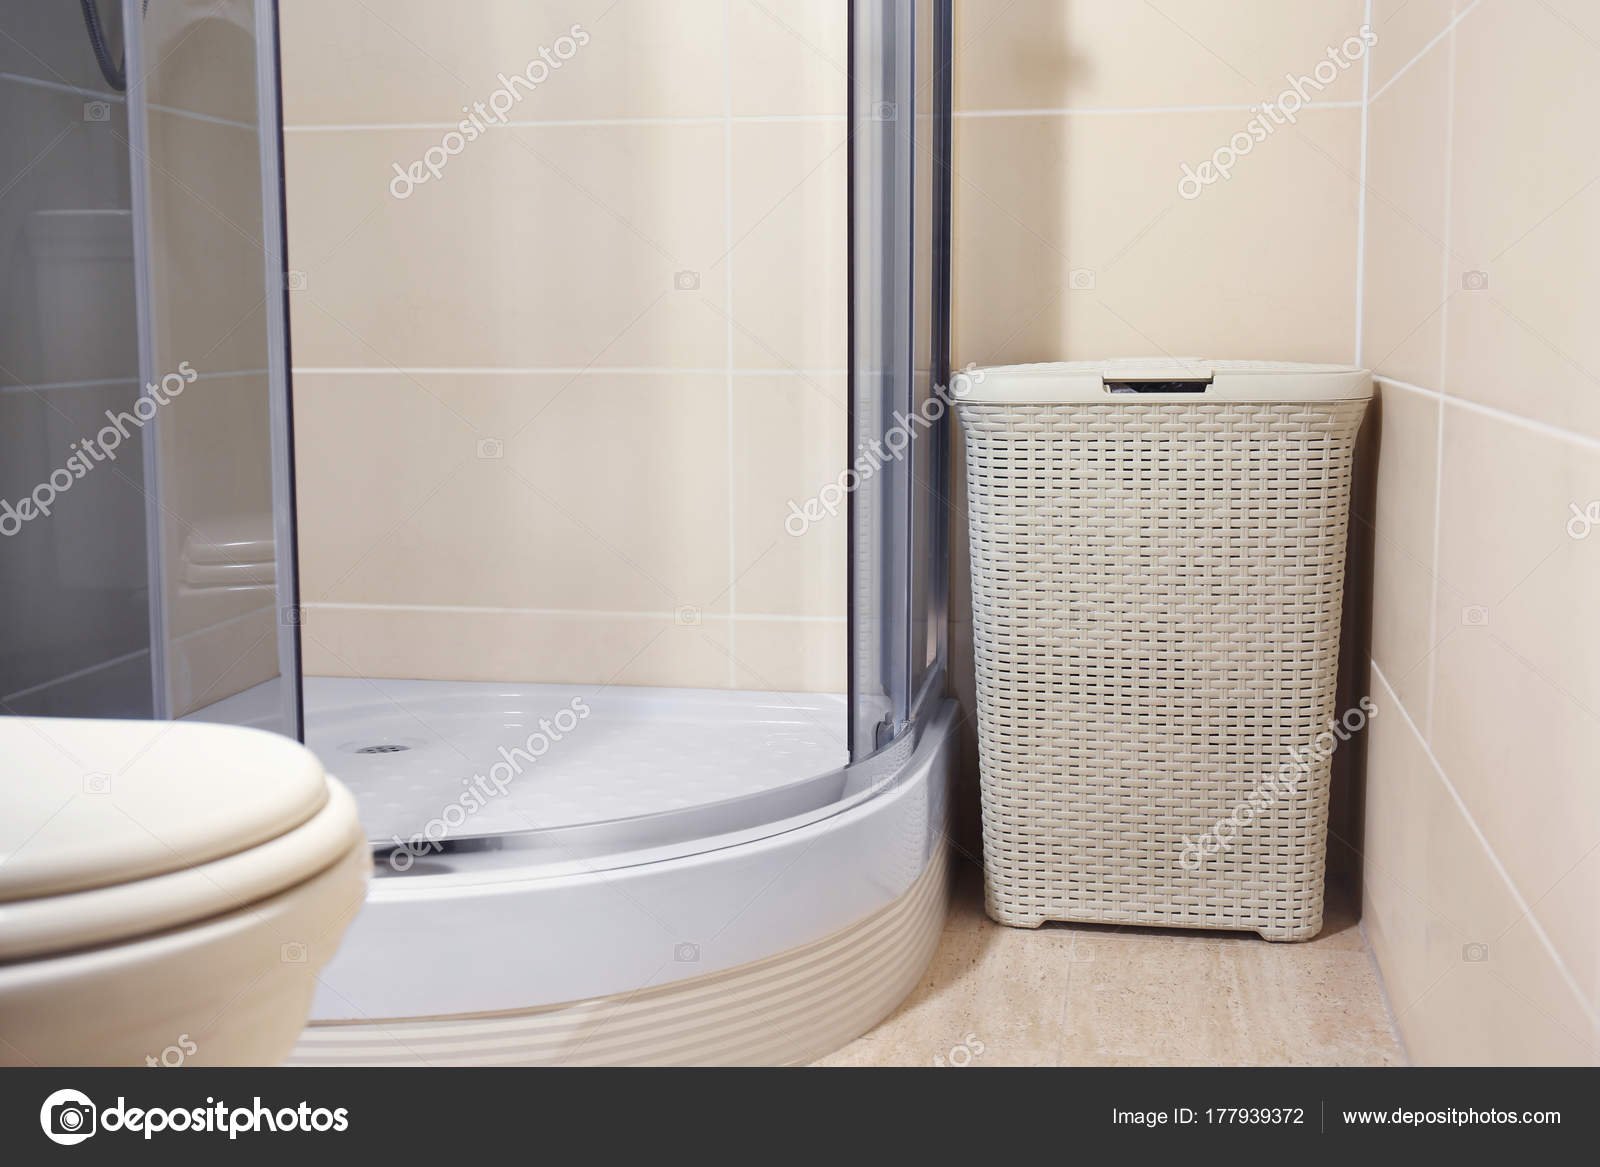 Wasmand in badkamer — Stockfoto © belchonock #177939372